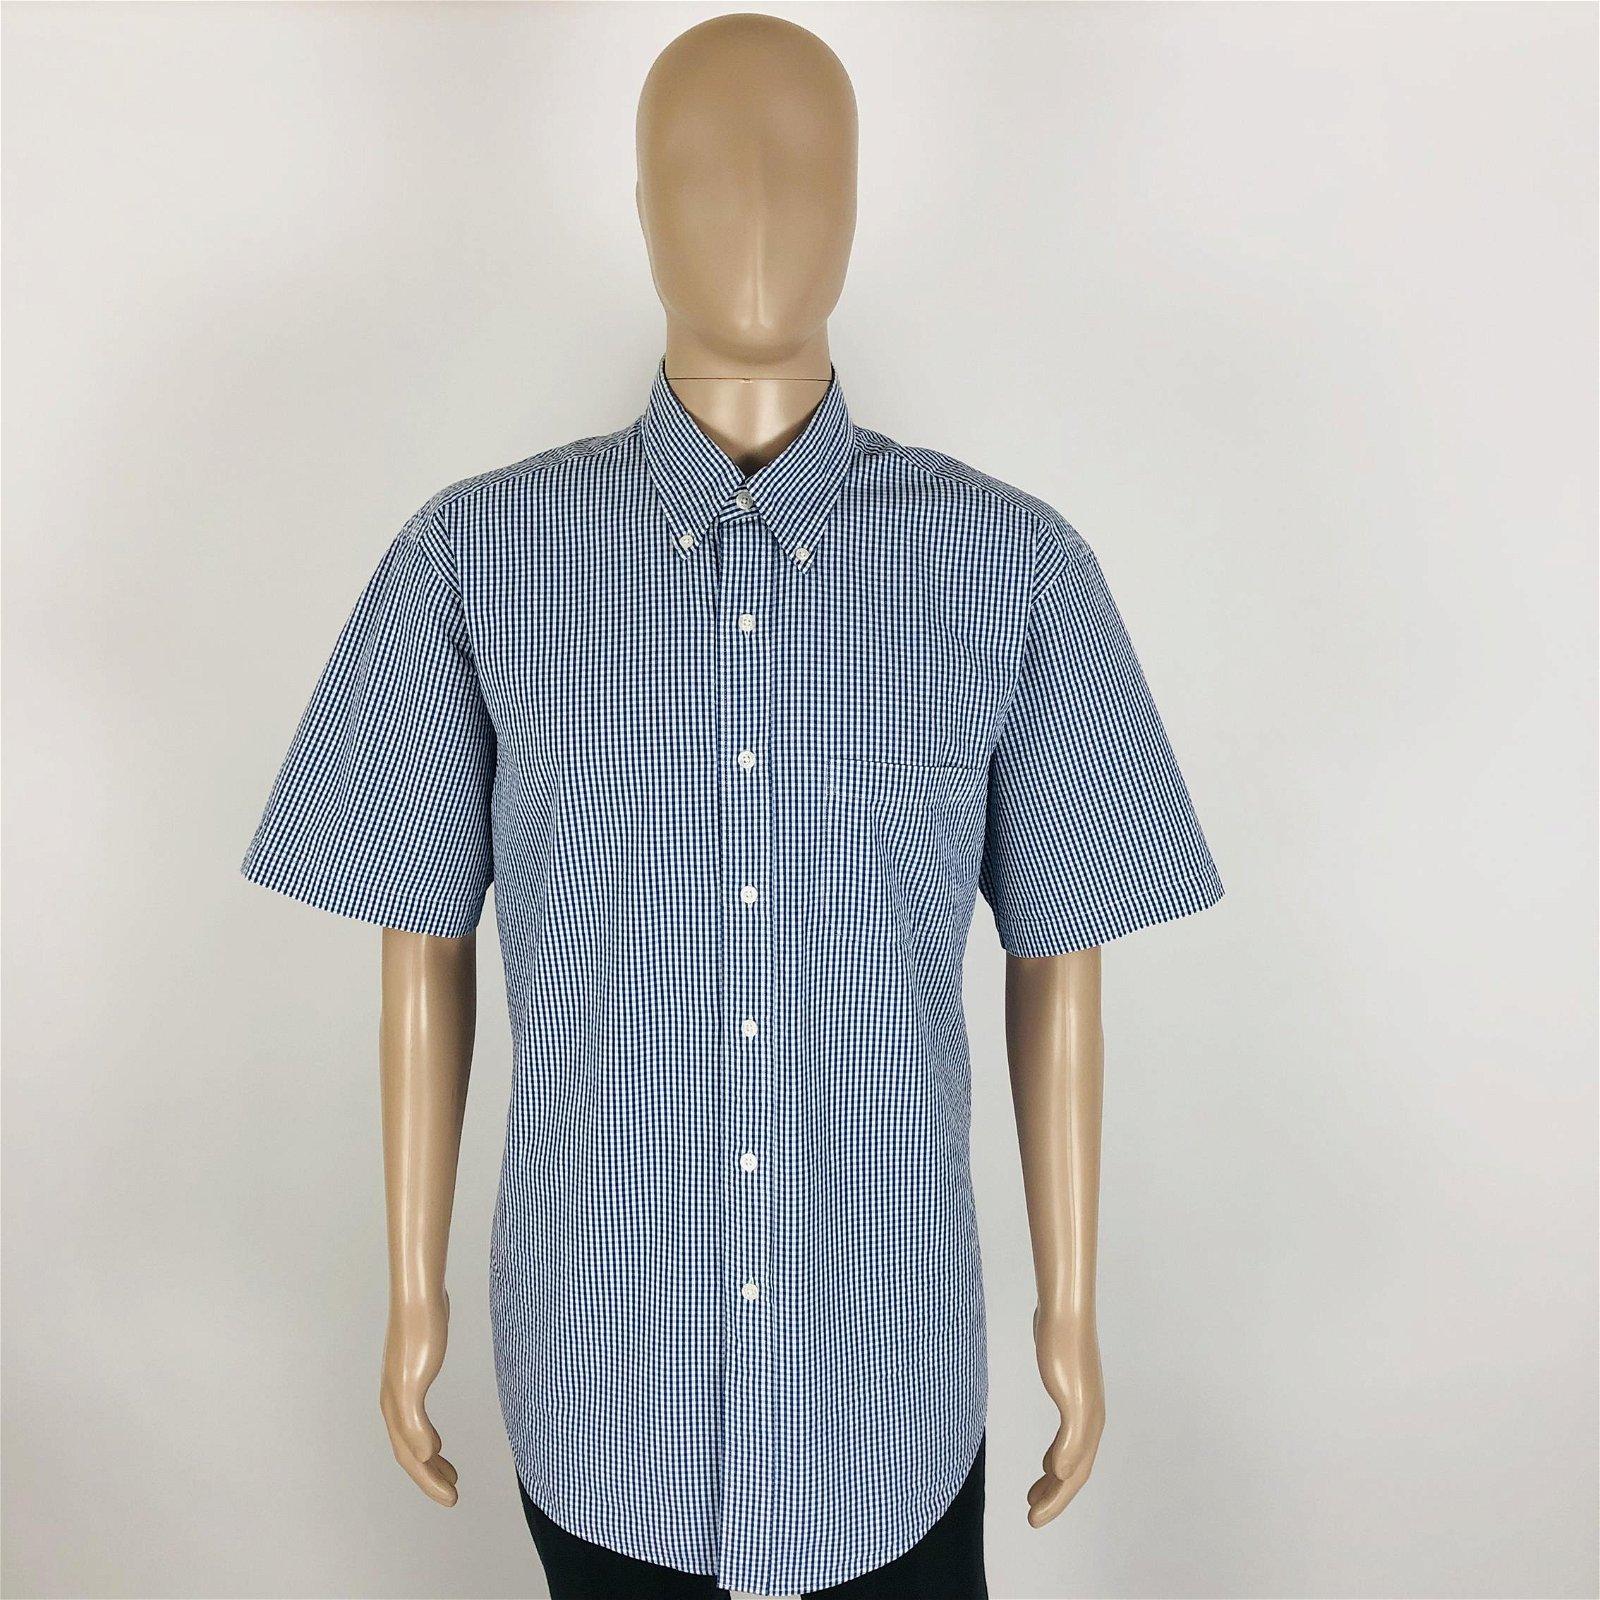 Men's Brooks Borthers Short Sleeve Shirt Top